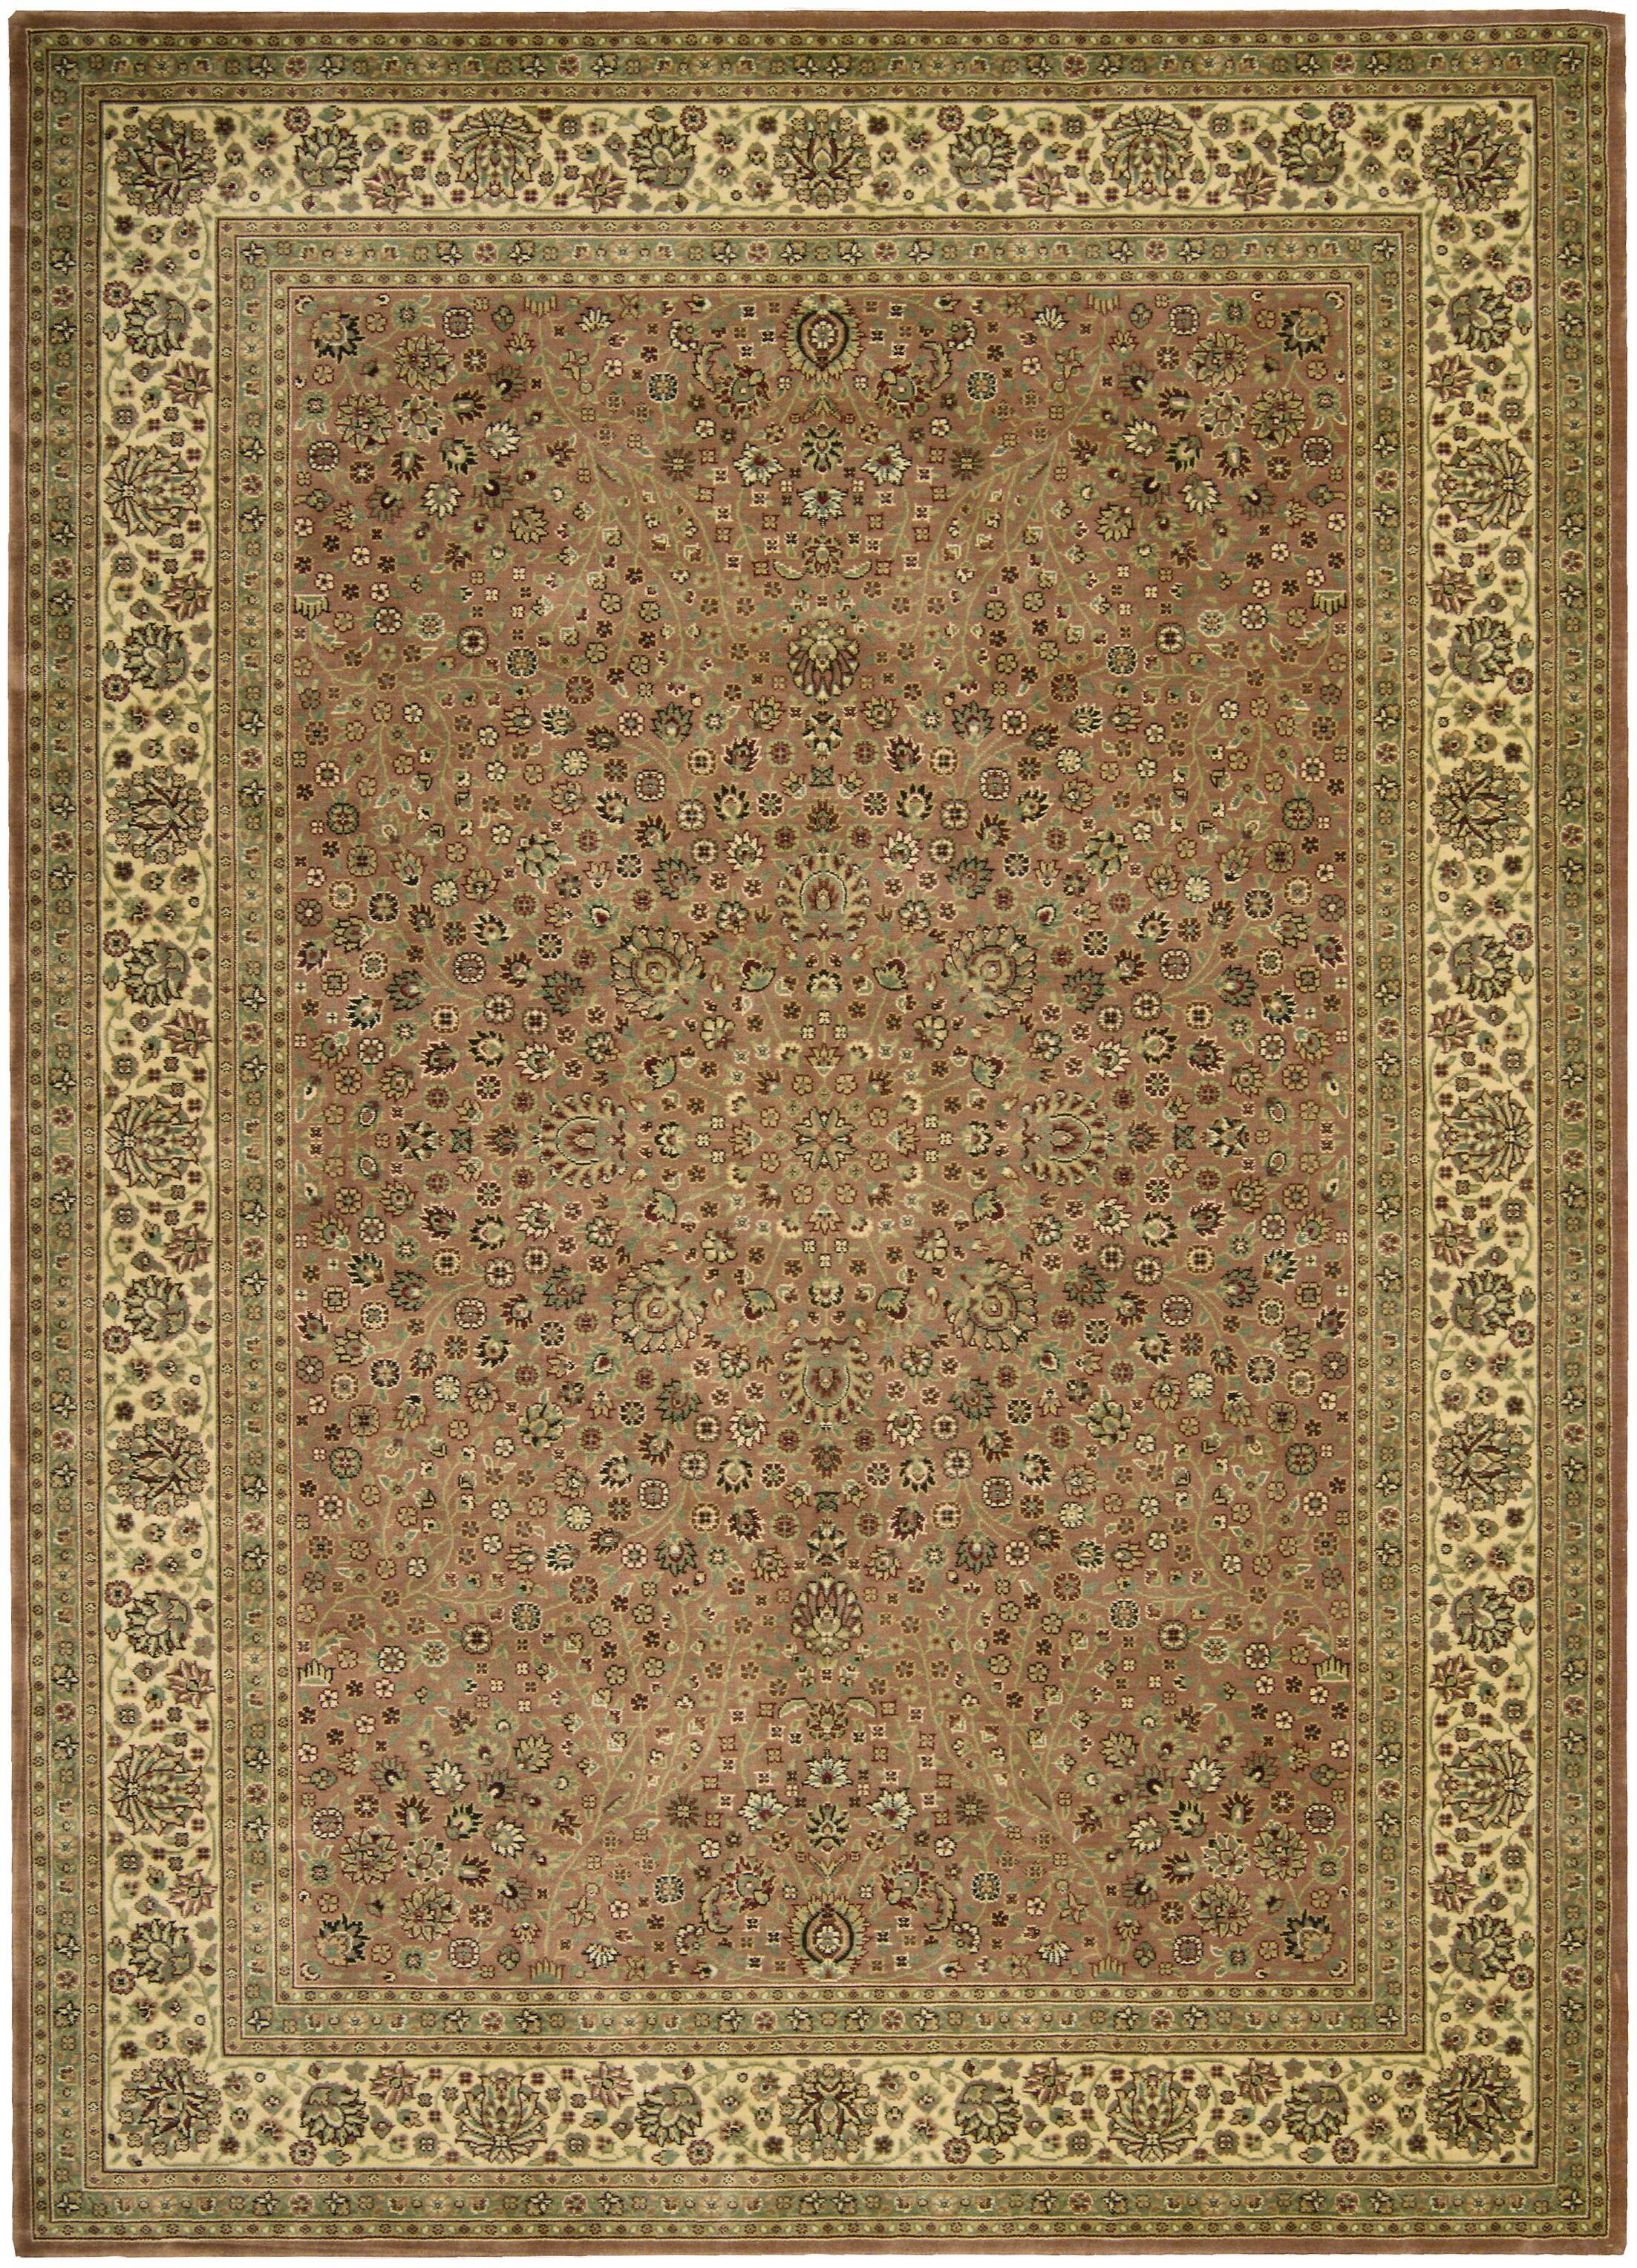 Olevia Persian Coffee Area Rug Rug Size: Rectangle 12' x 13'4